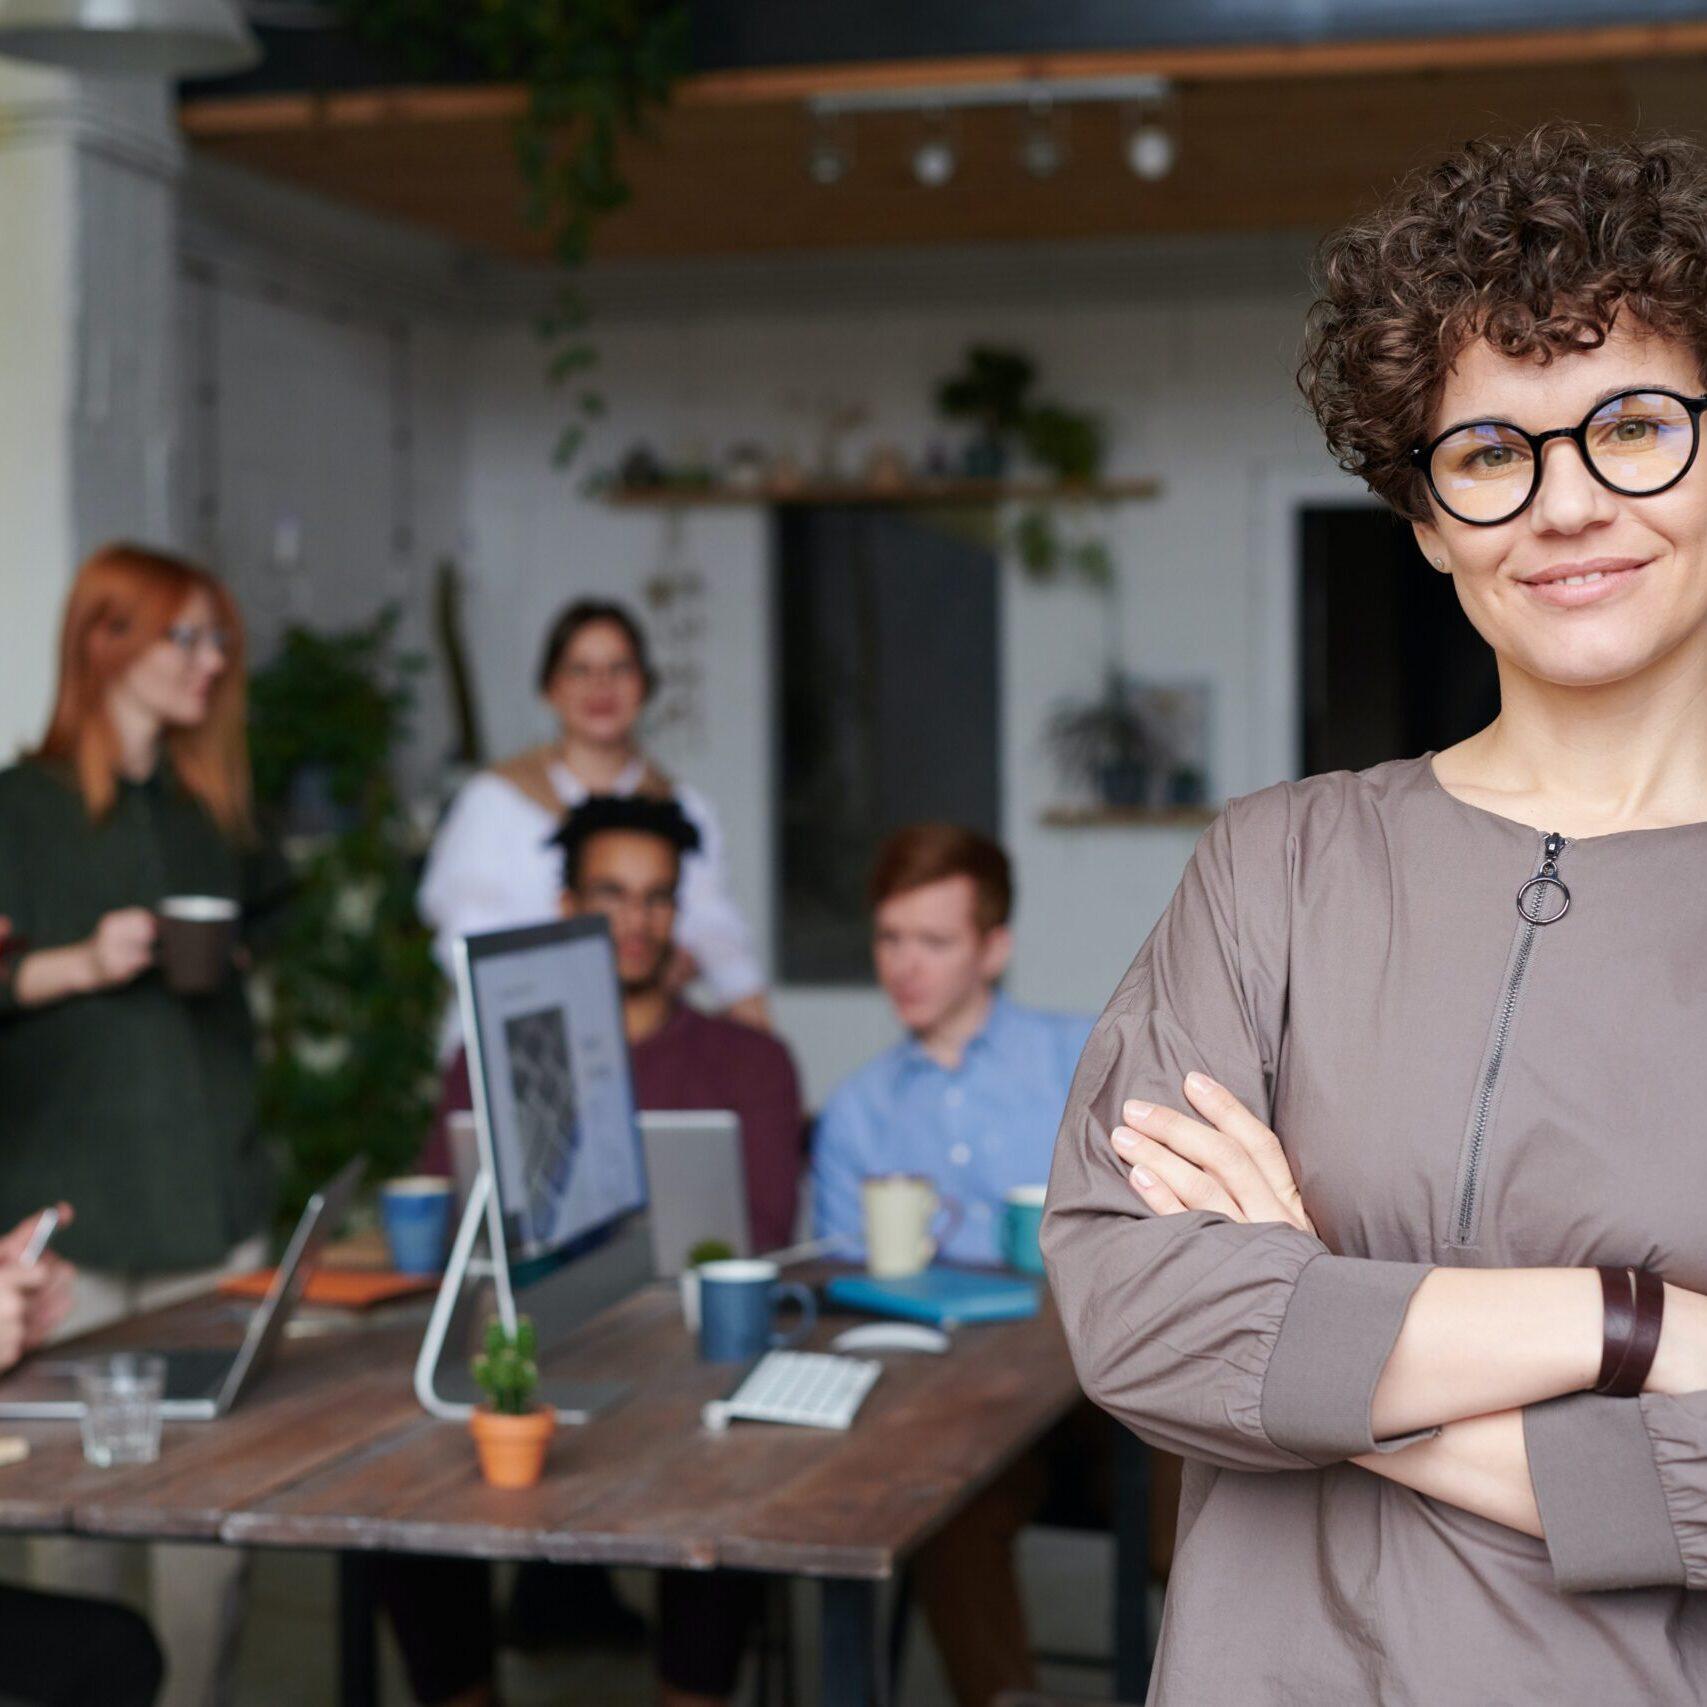 Cleveland area women entrepreneurs